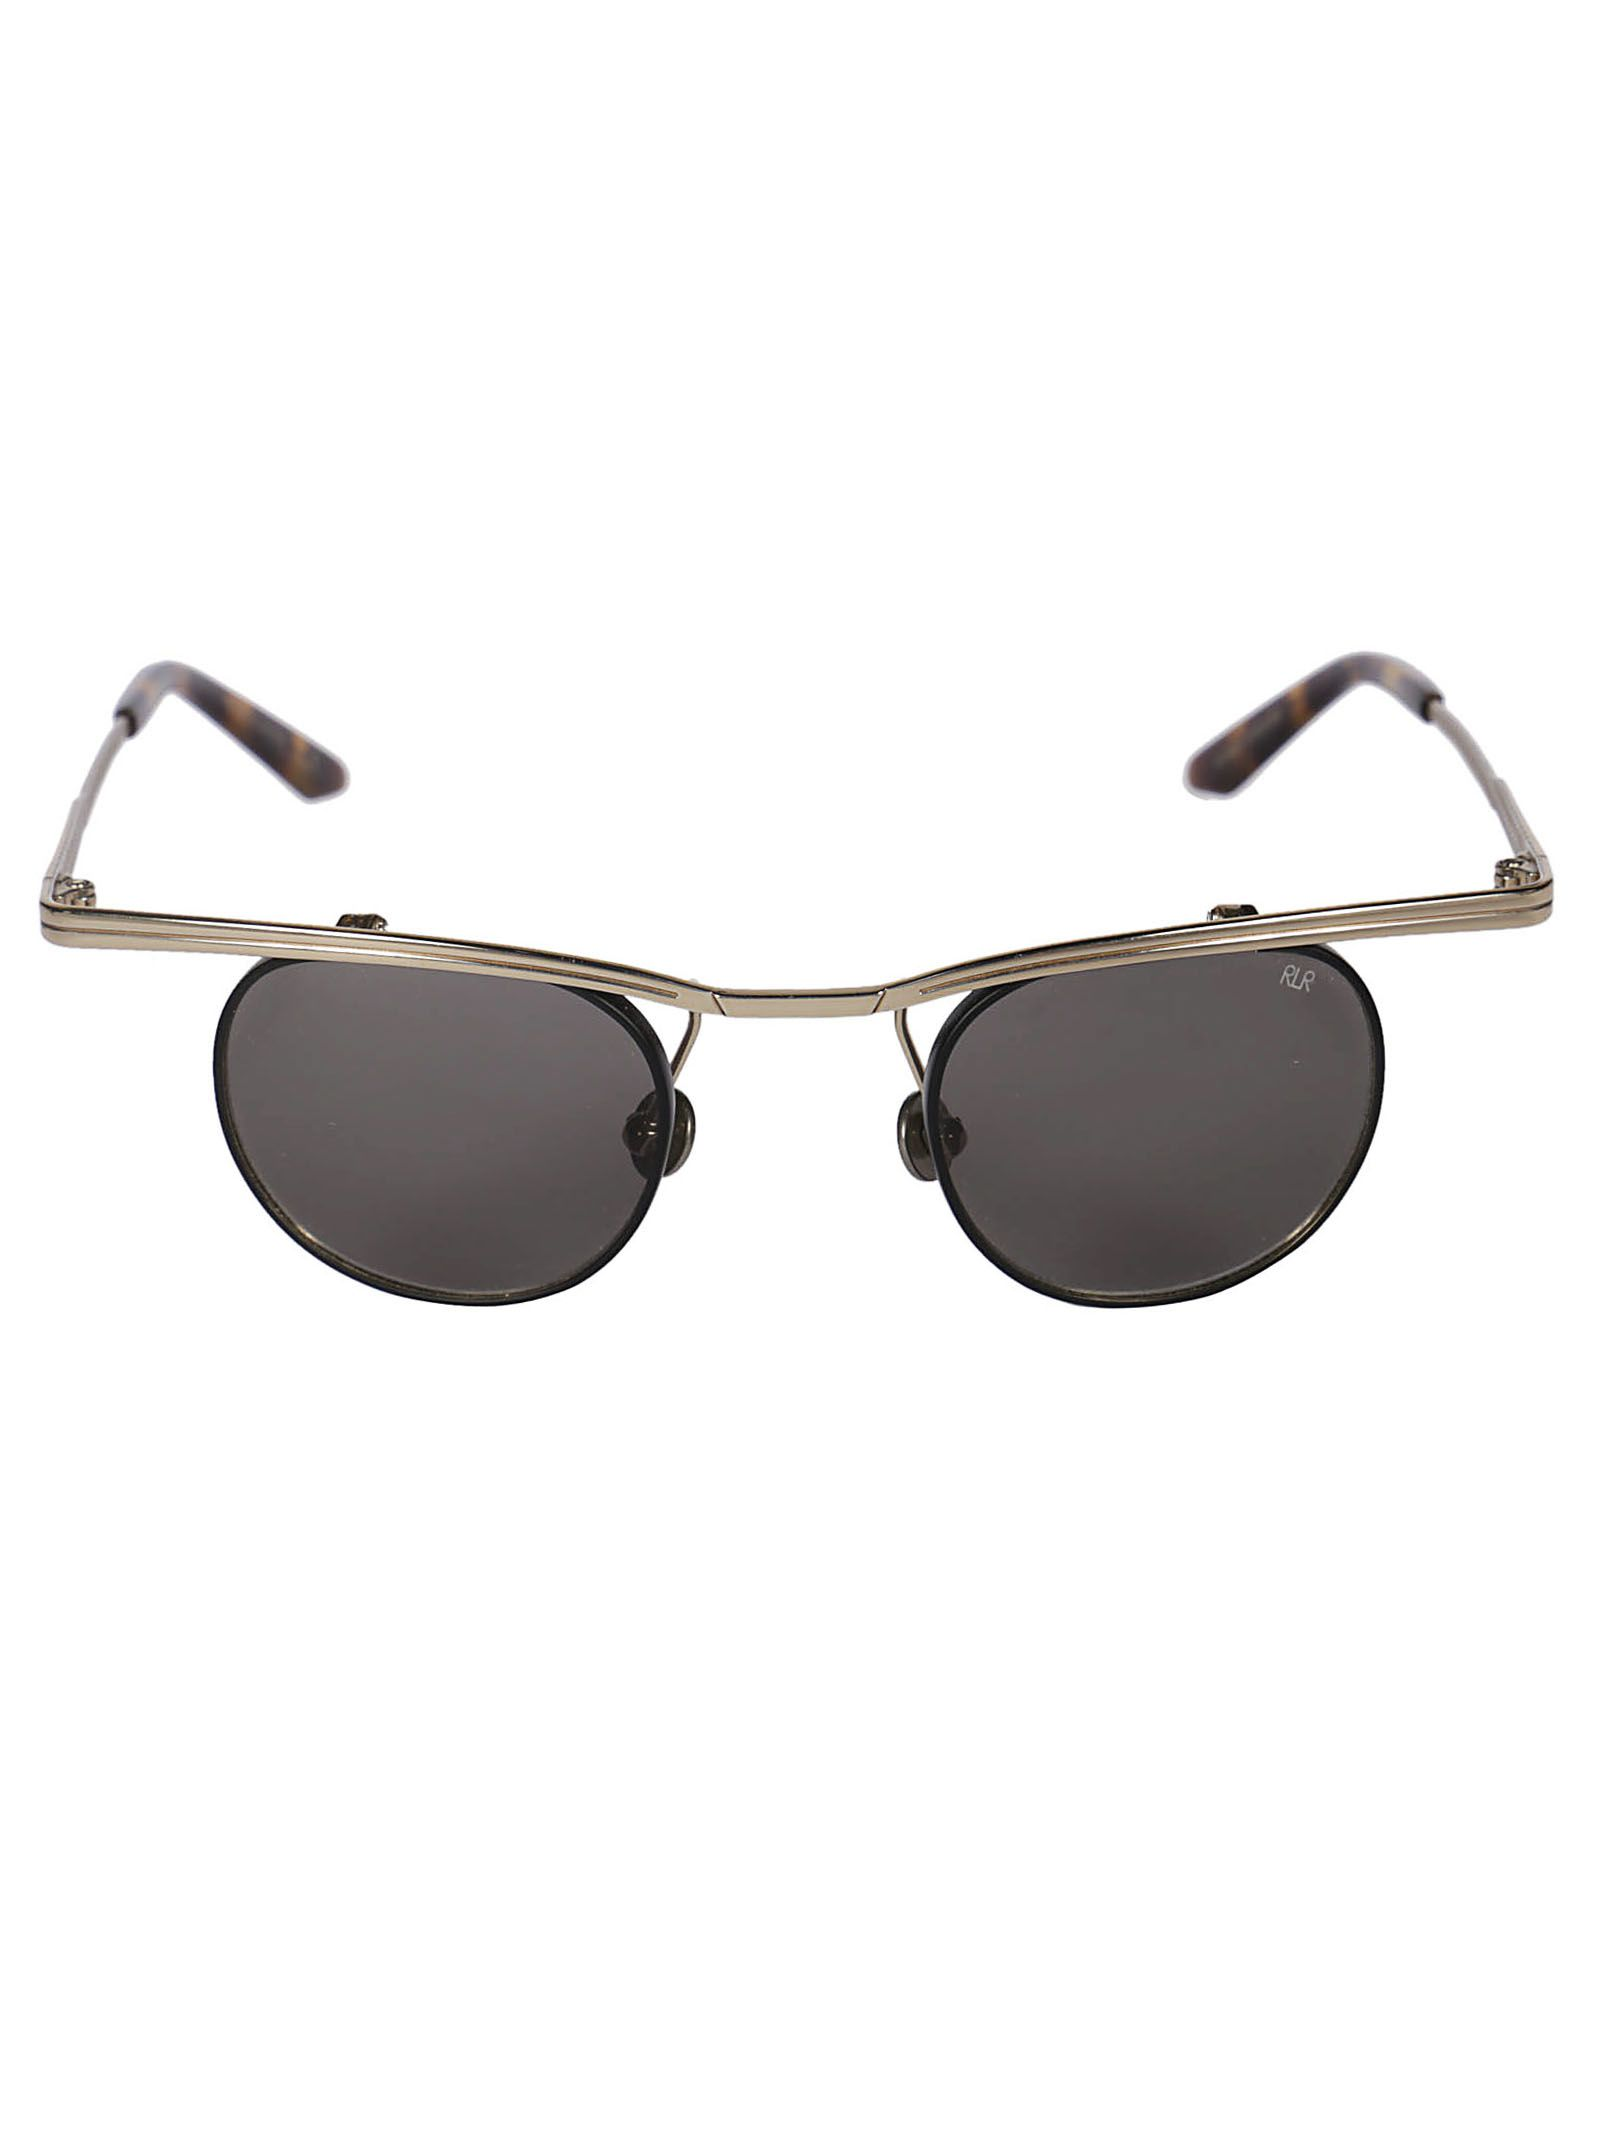 Robert Laroche Winged Round Frame Sunglasses